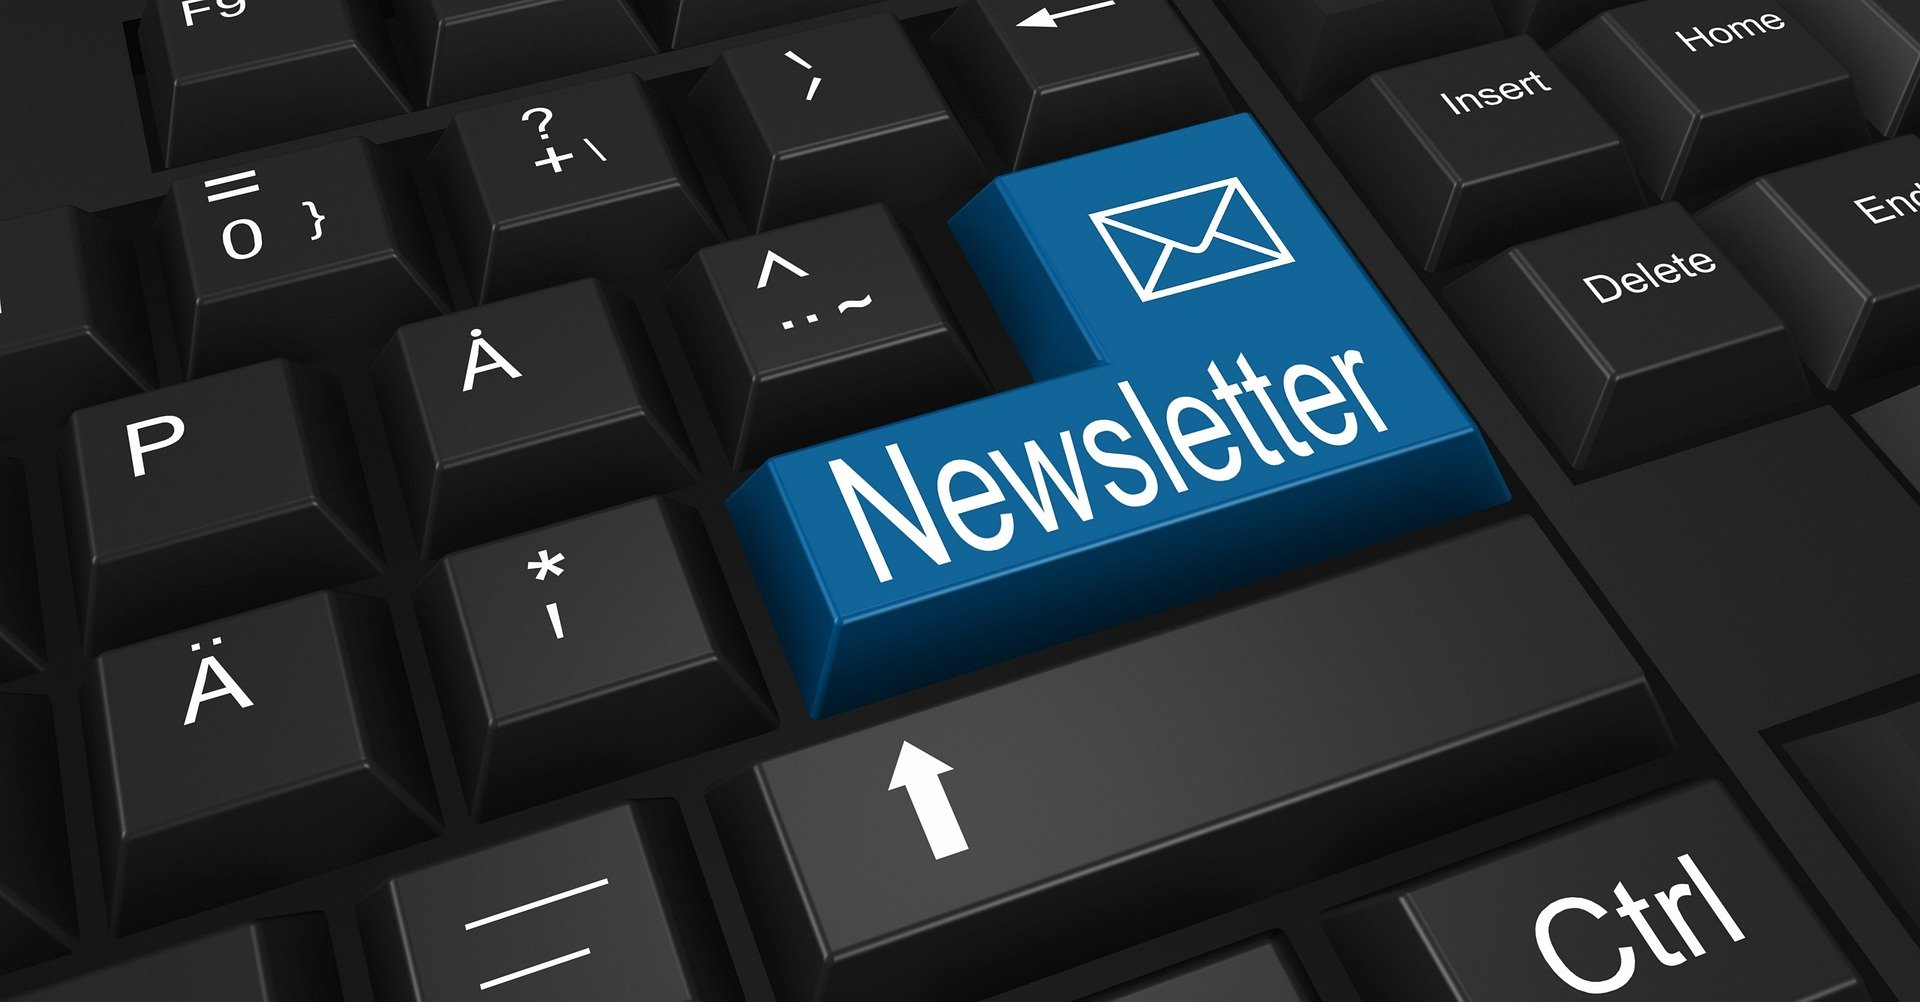 Newsletter-Tool als Datenschutzrisiko